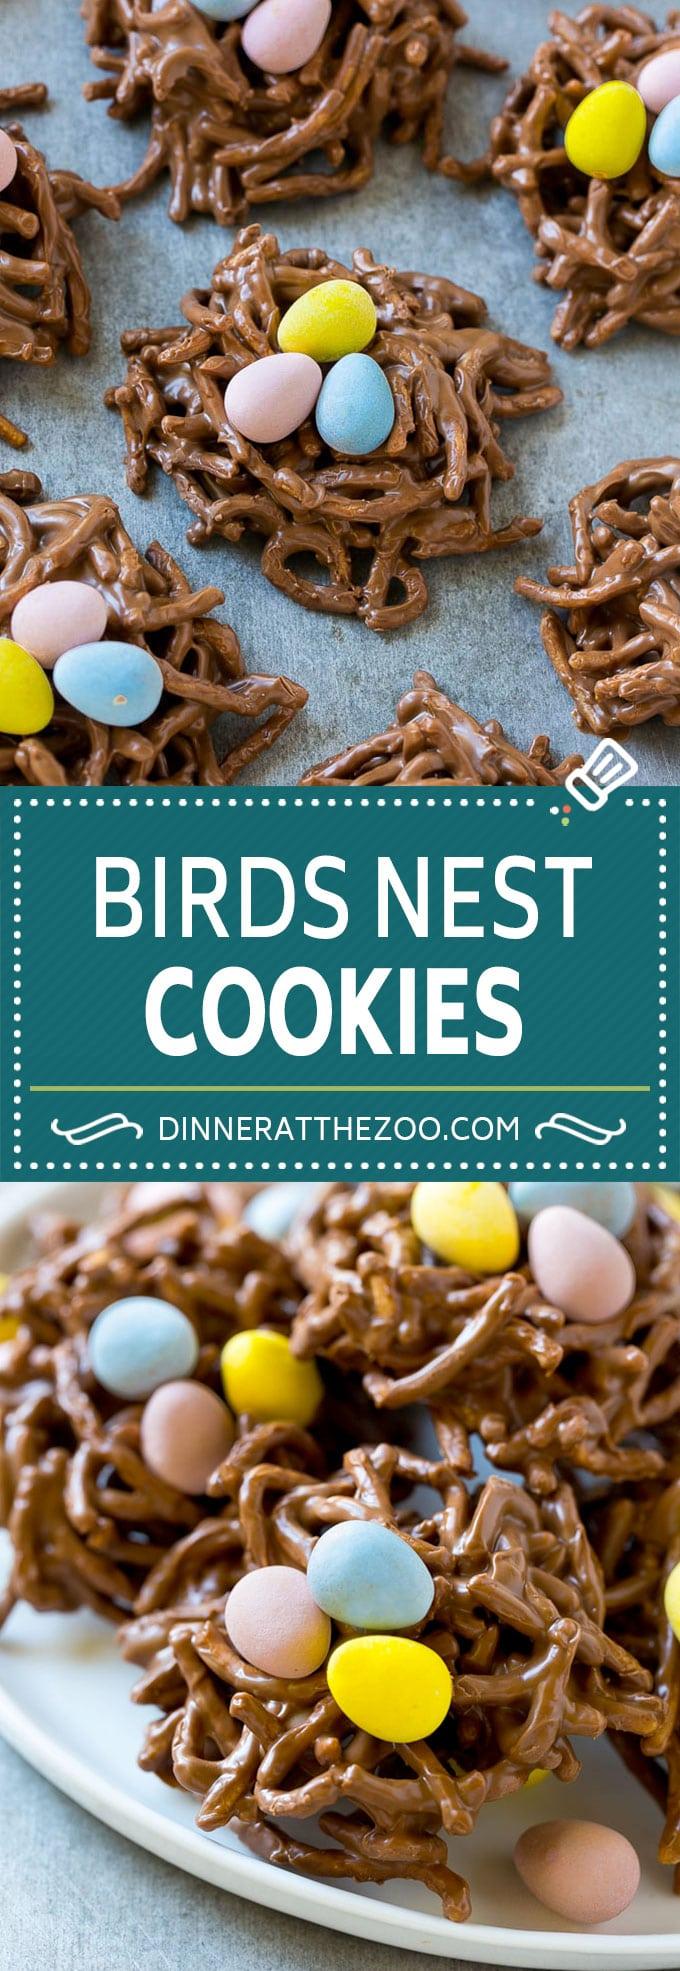 Birds Nest Cookies | Chow Mein Noodle Cookies | Easter Cookies | No Bake Cookies #cookies #easter #nobake #chocolate #dessert #dinneratthezoo